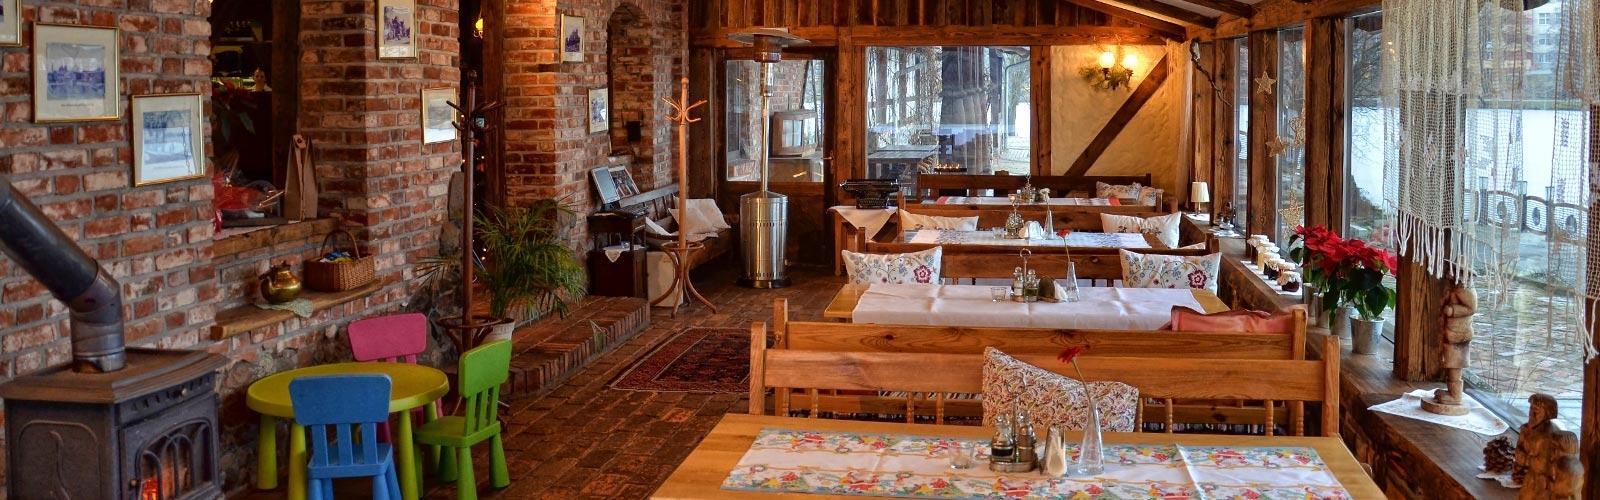 Restauracja Mazury Stary Tartak